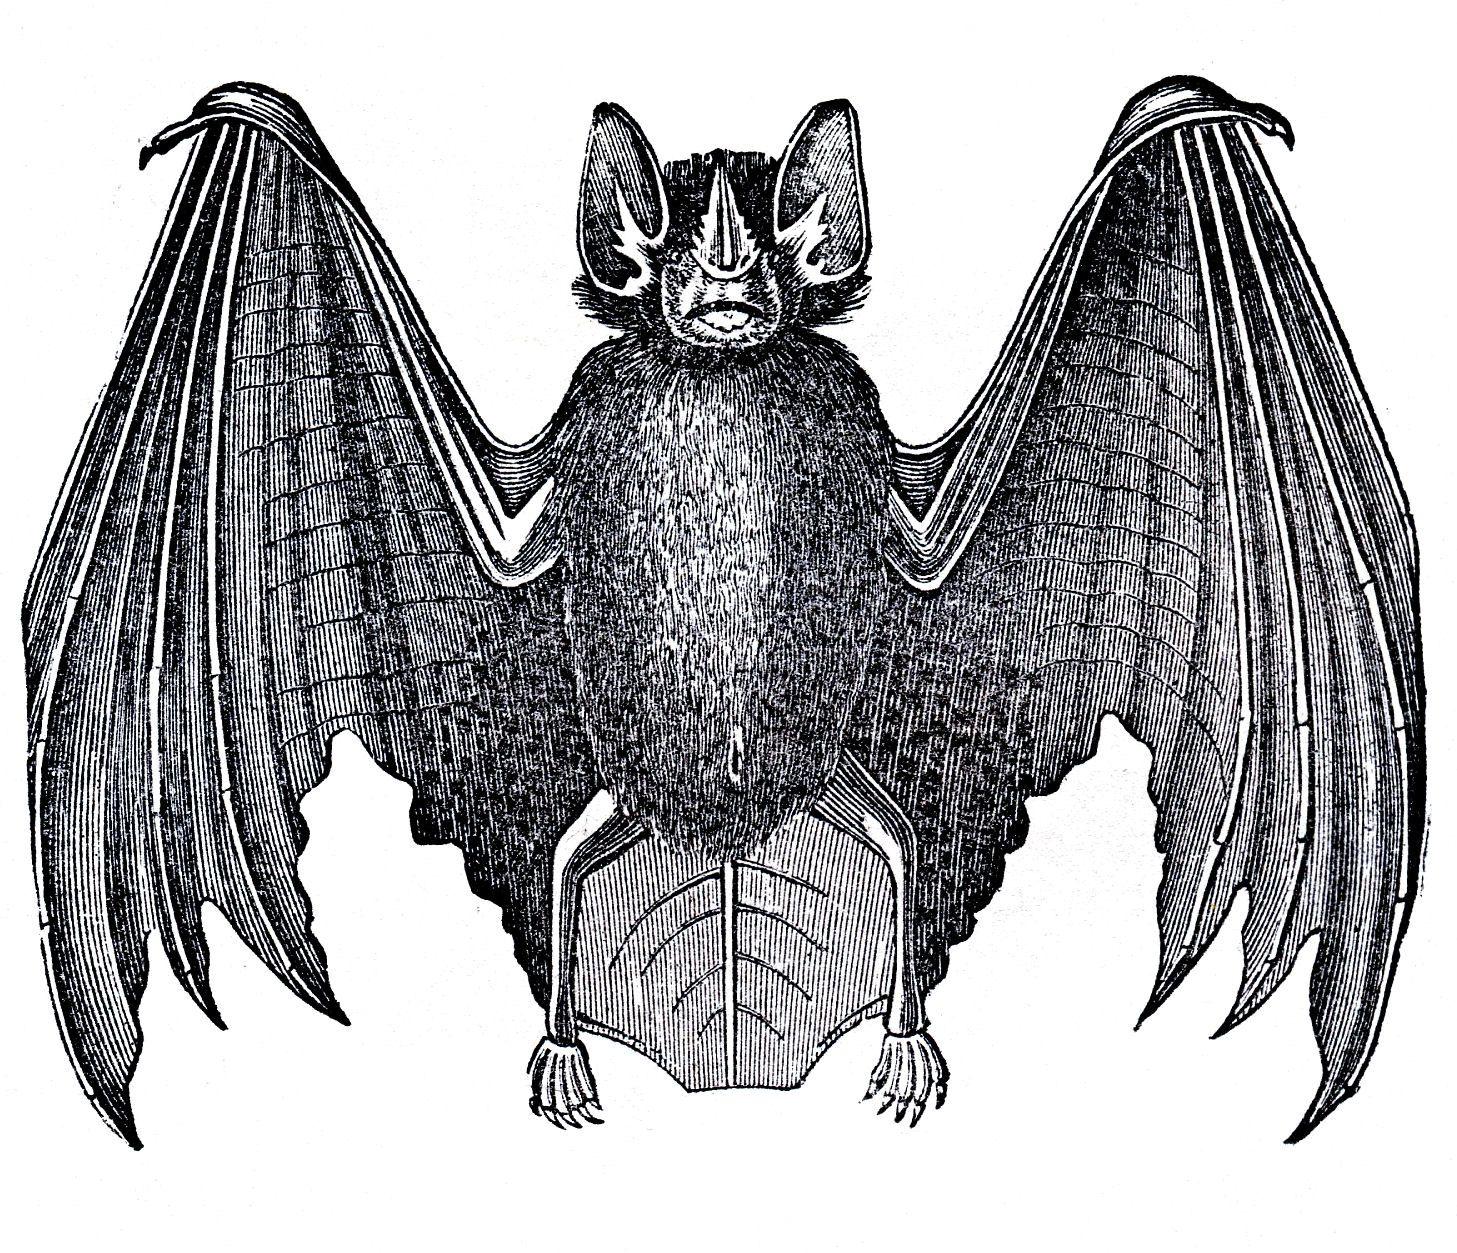 Download image antique halloween. Bat clipart vintage